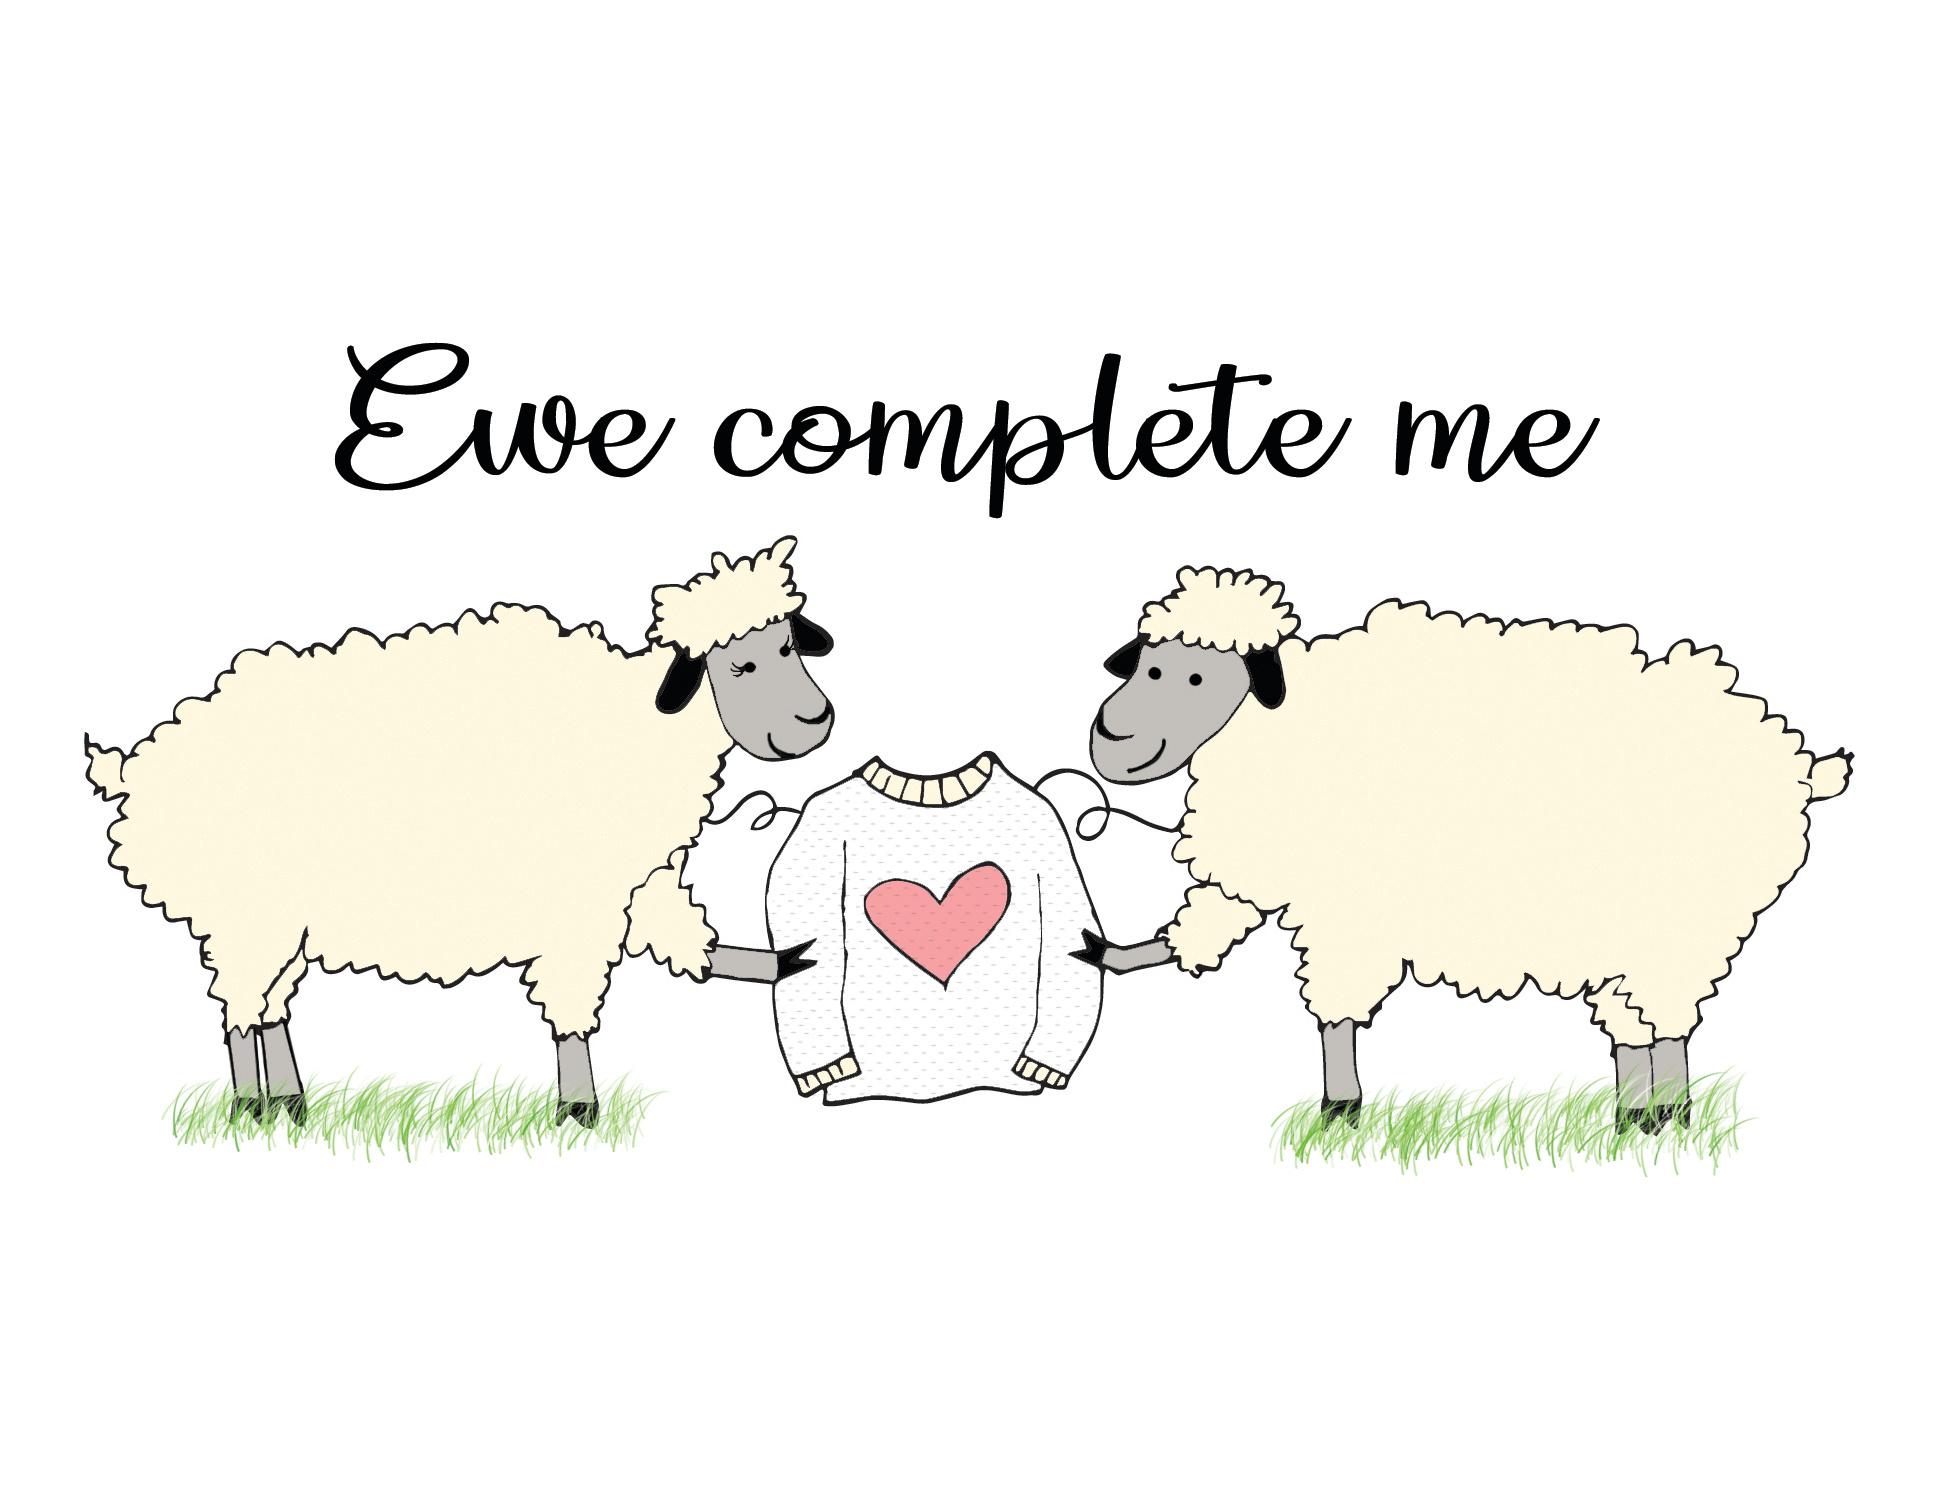 Ewe Complete Me